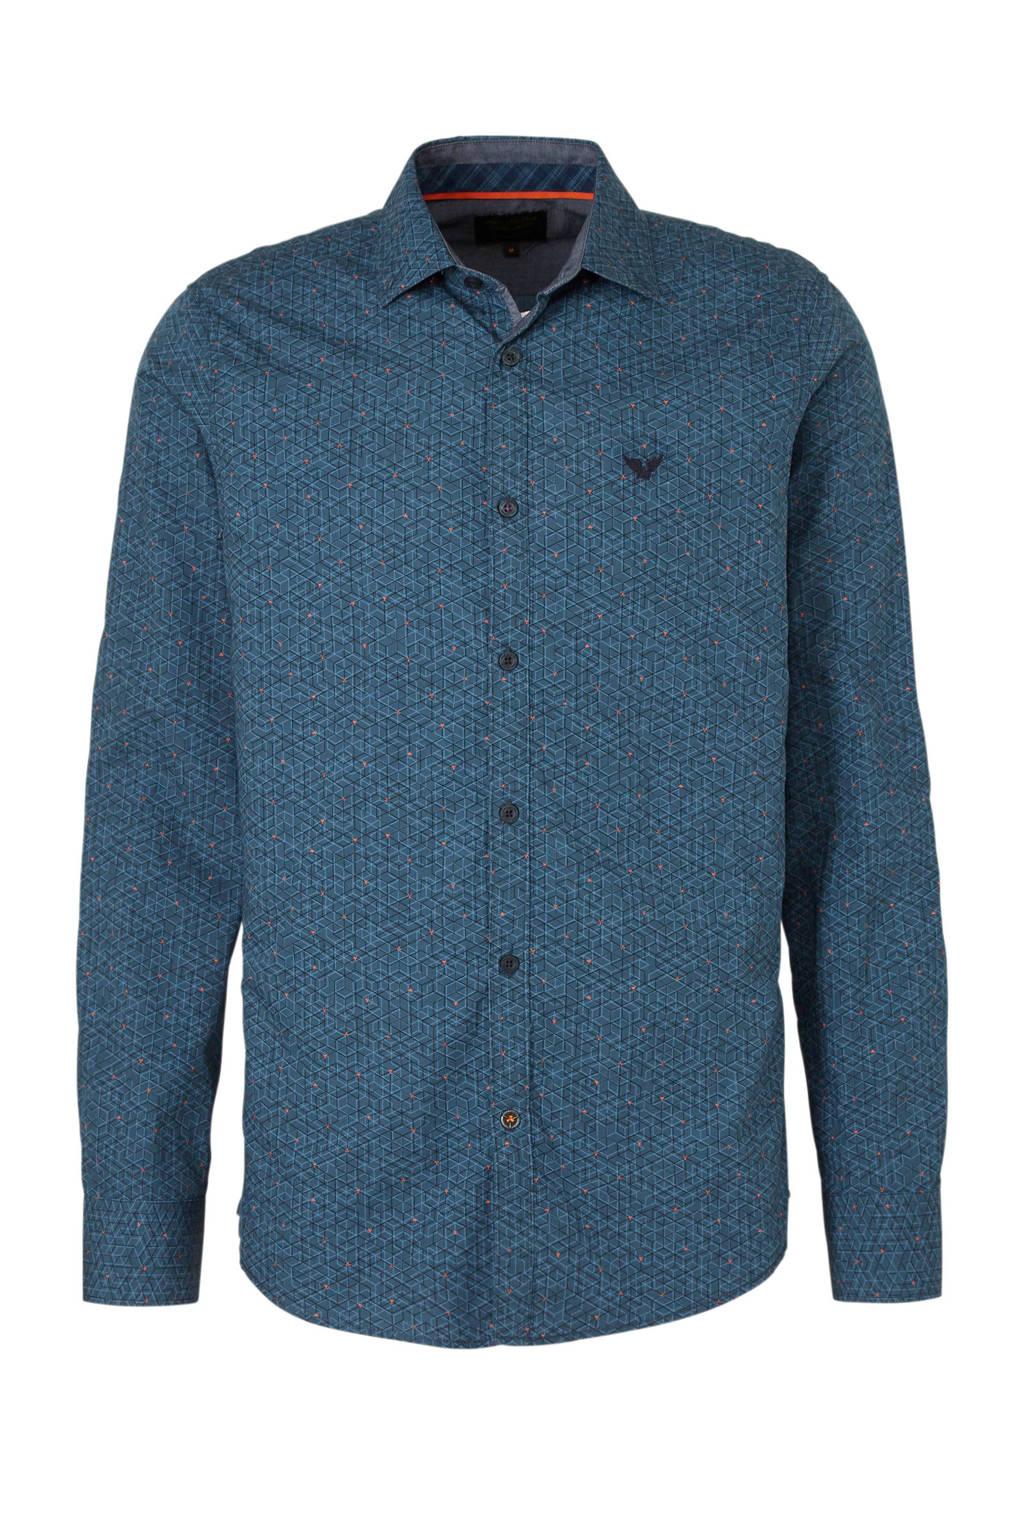 Donkerblauw Overhemd.Pme Legend Overhemd Met All Over Print Donkerblauw Wehkamp